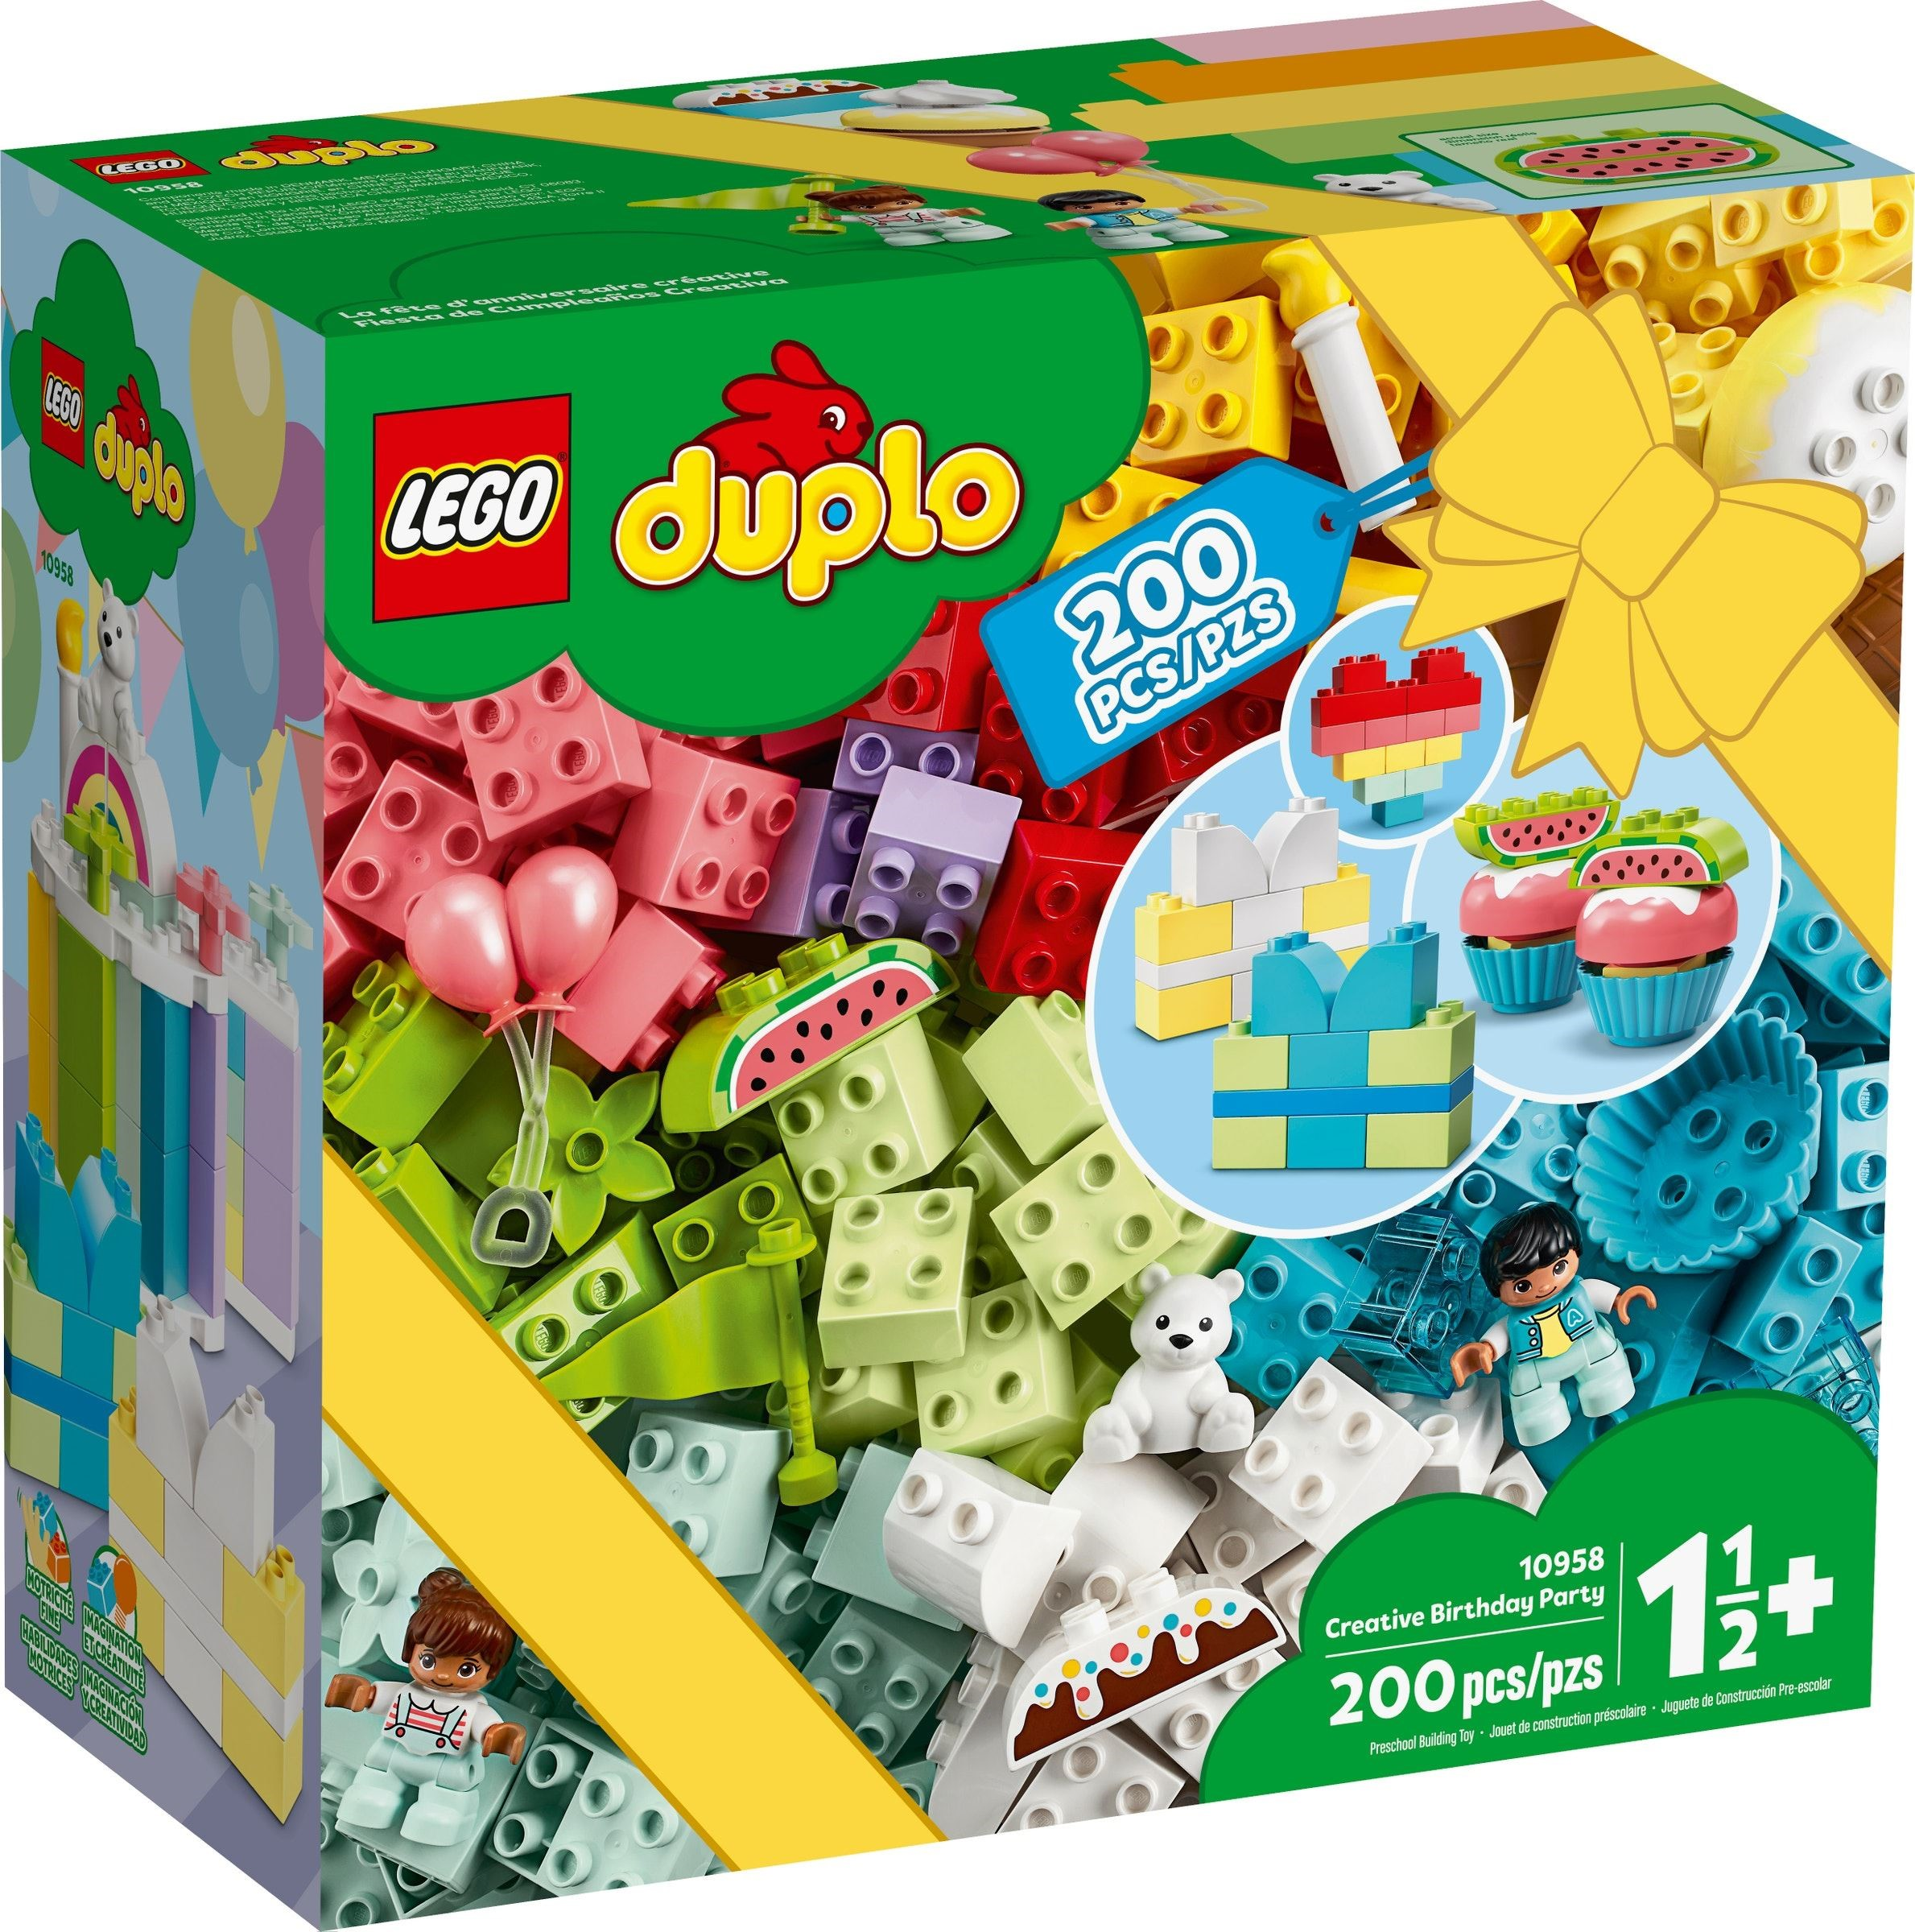 LEGO DUPLO - Creative Birthday Party (10958)